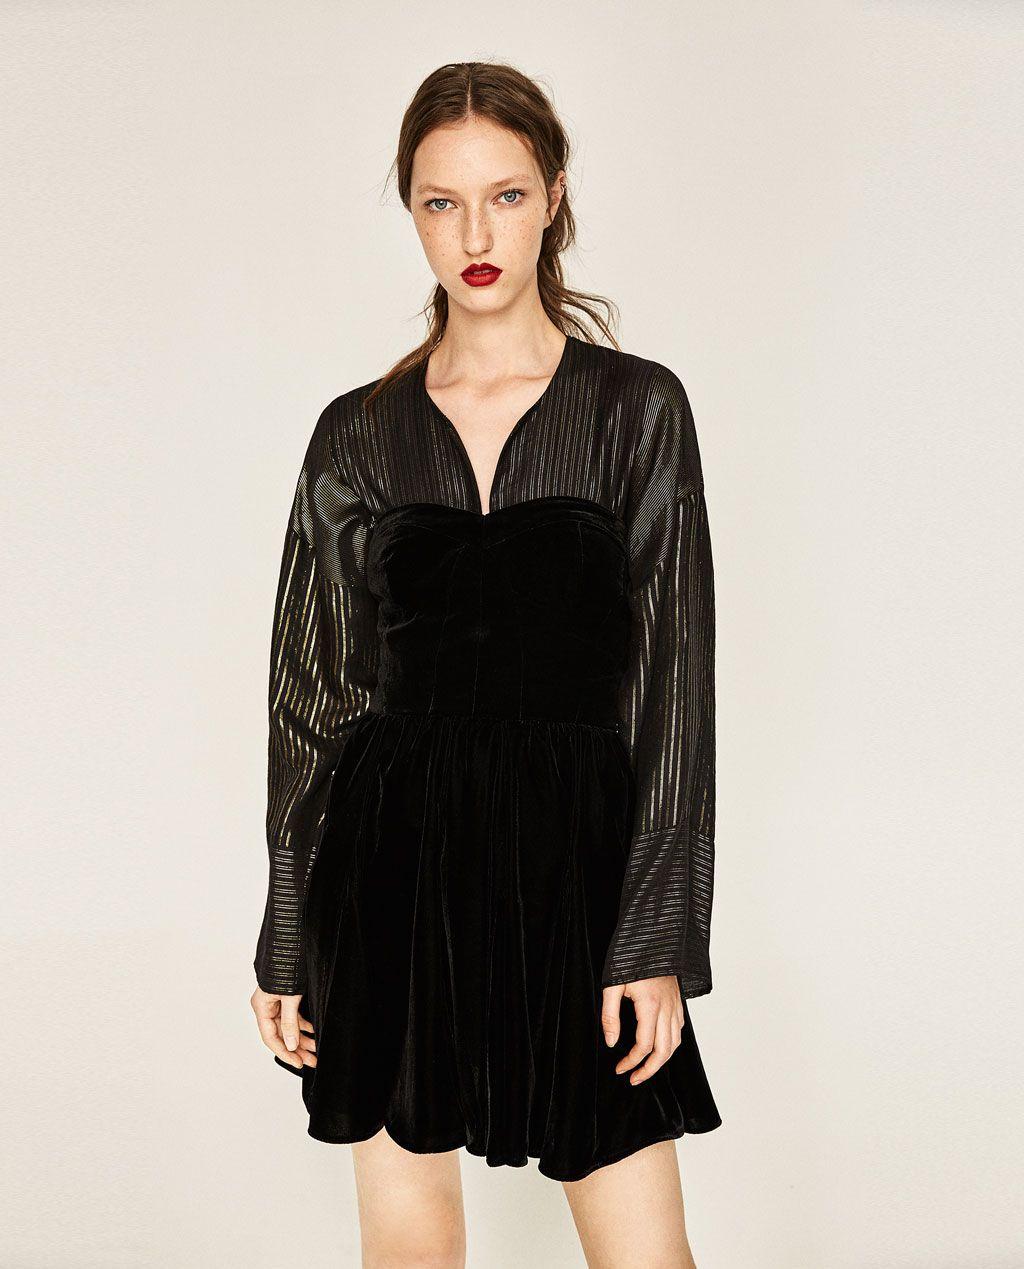 fa08727c51c8 ZARA - WOMAN - VELVET MINI DRESS